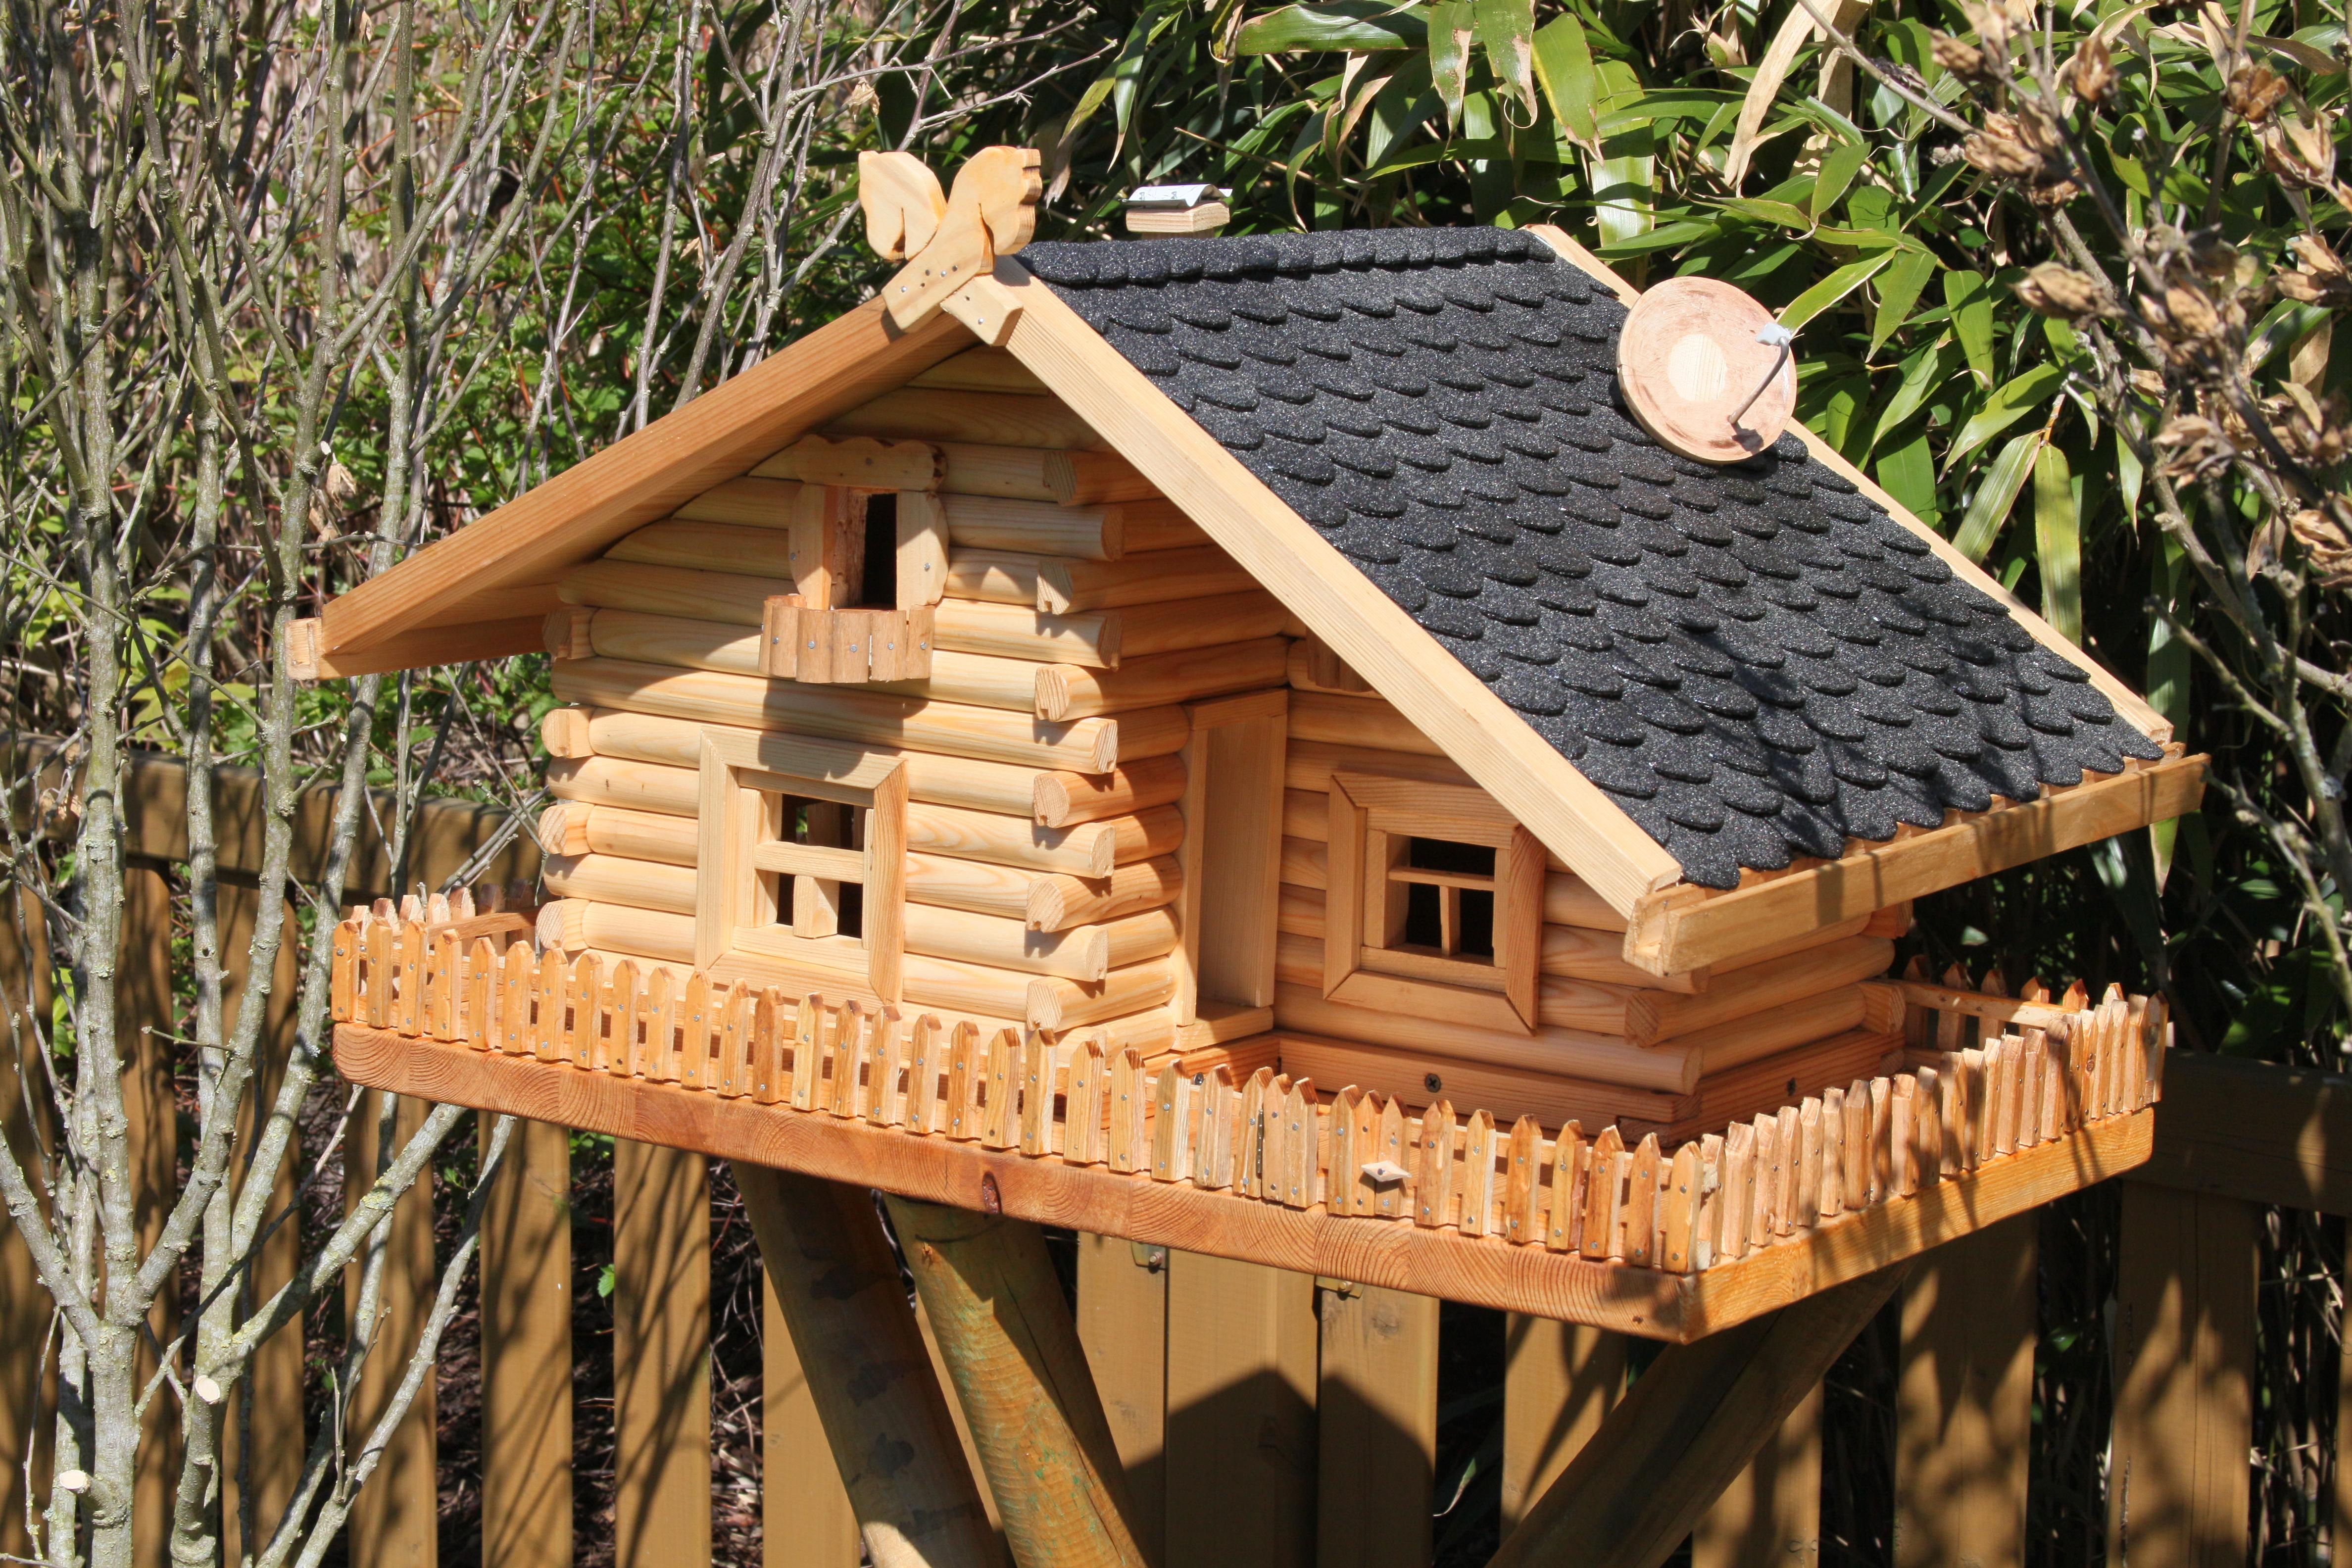 file vogelhaus modell eduard 4 jpg wikimedia commons. Black Bedroom Furniture Sets. Home Design Ideas